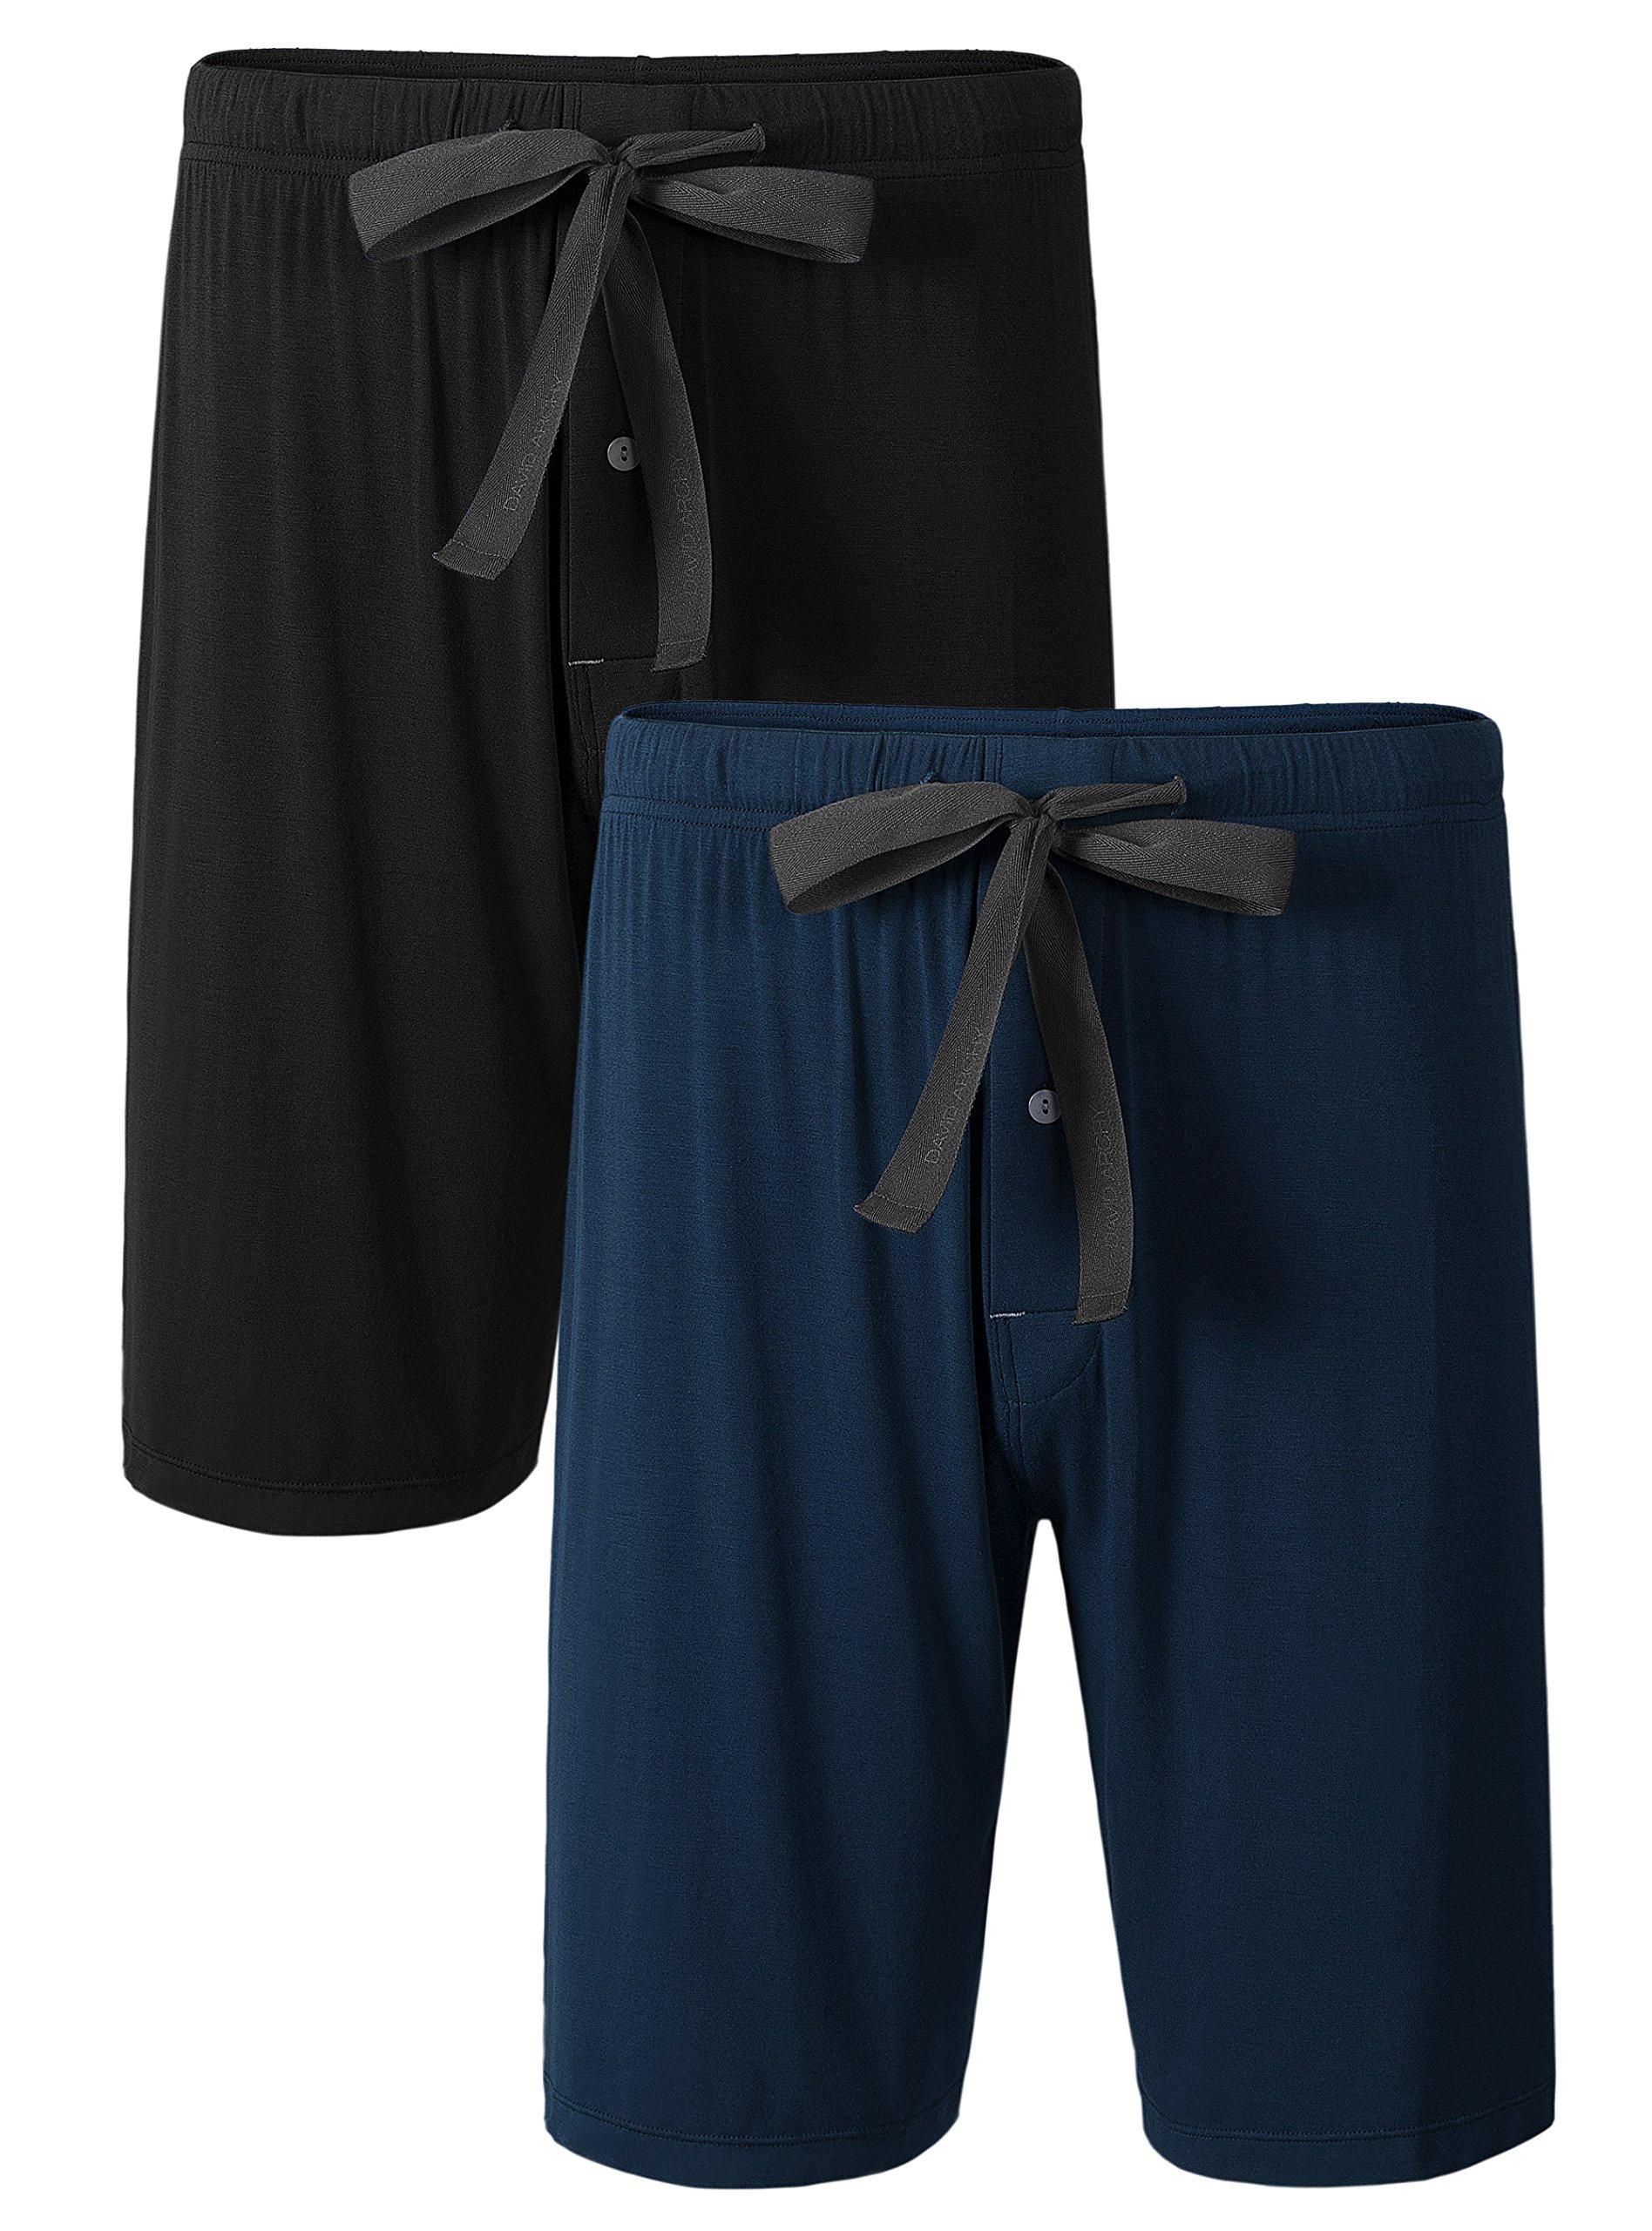 David Archy Men's 2 Pack Soft Comfy Bamboo Rayon Sleep Shorts Lounge Wear Pajama Pants (M, Black+Navy Blue)